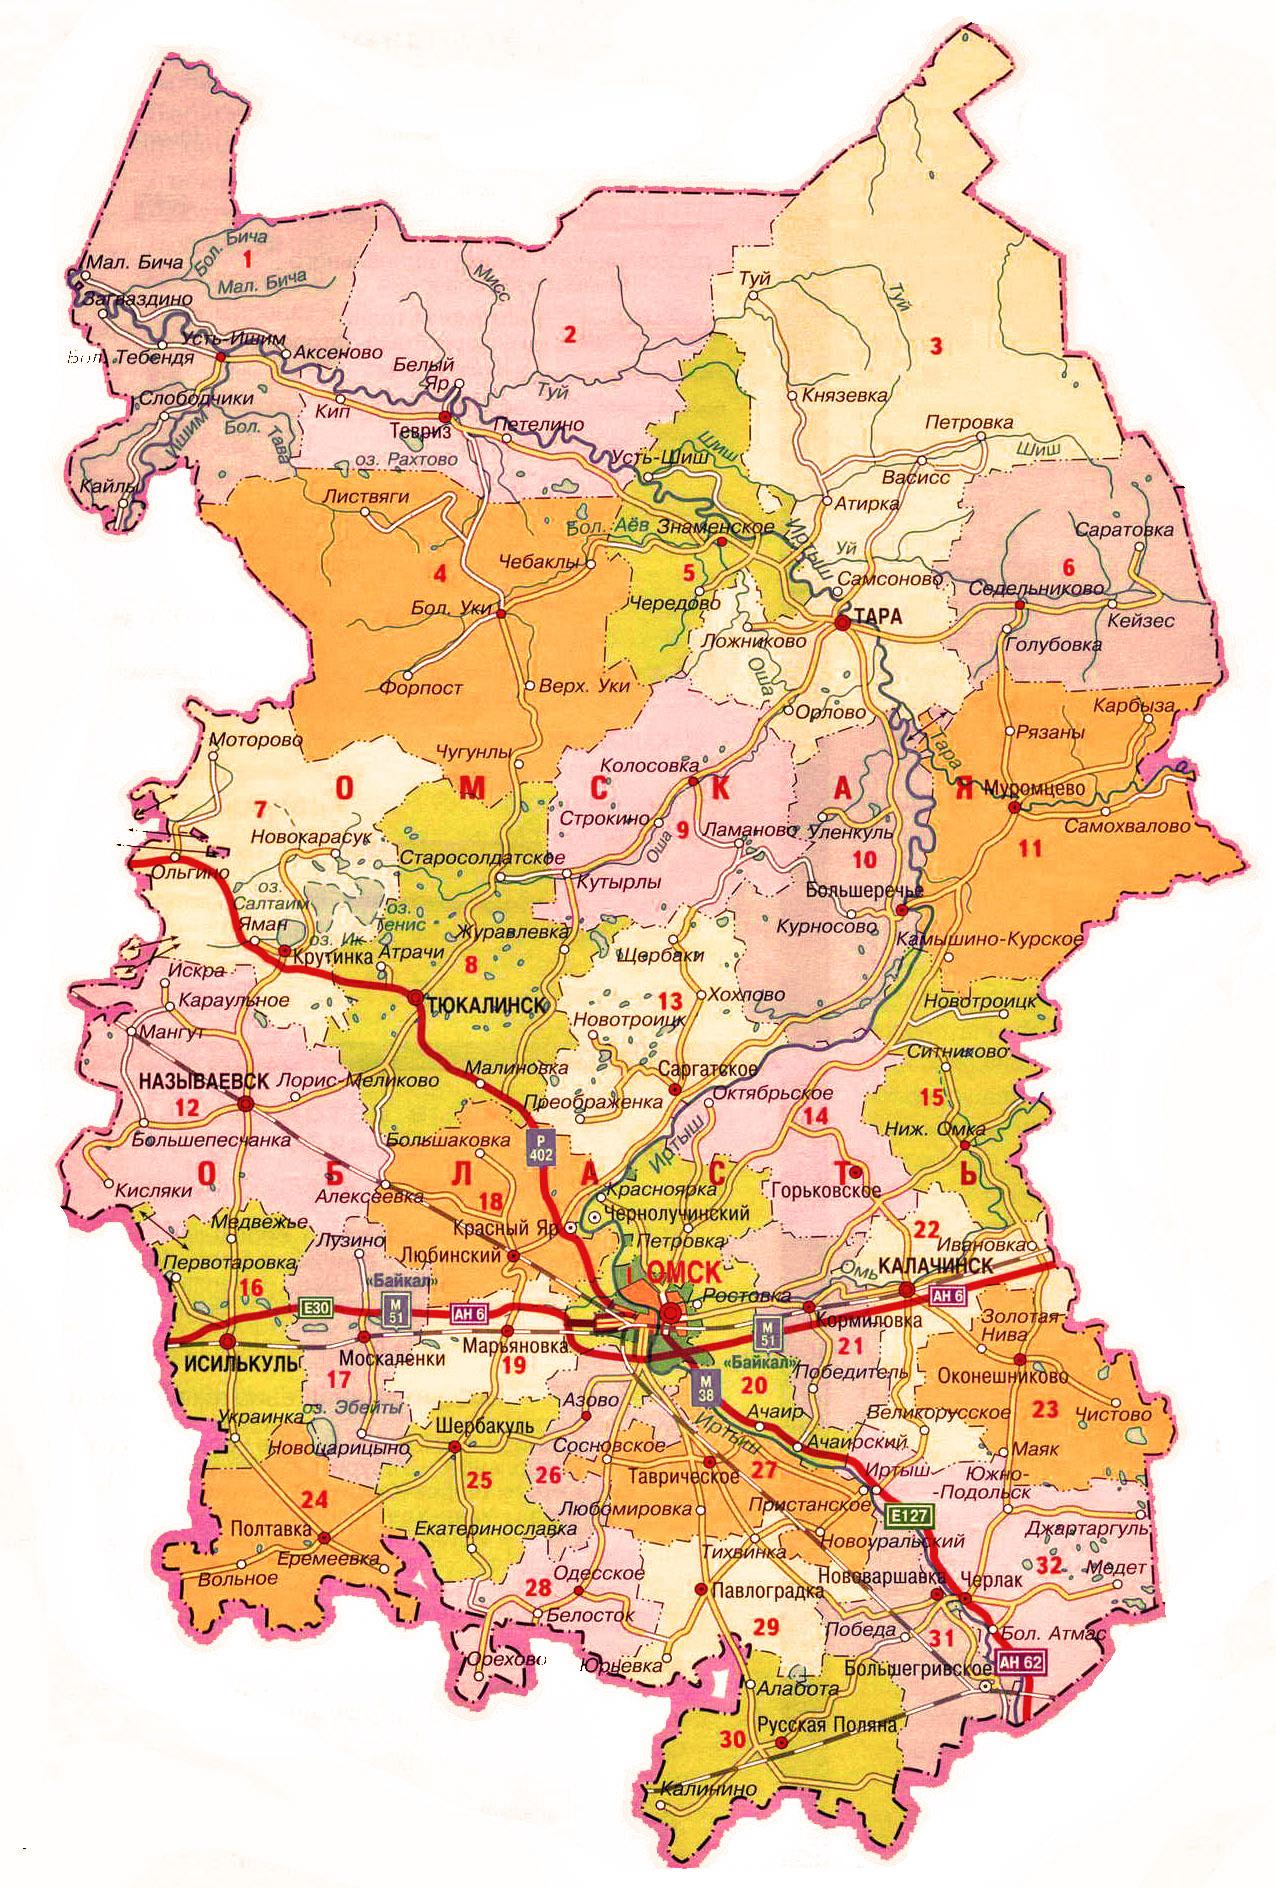 Карты городов Омской области: http://haveall.net/karty-gorodov-omskoj-oblasti/